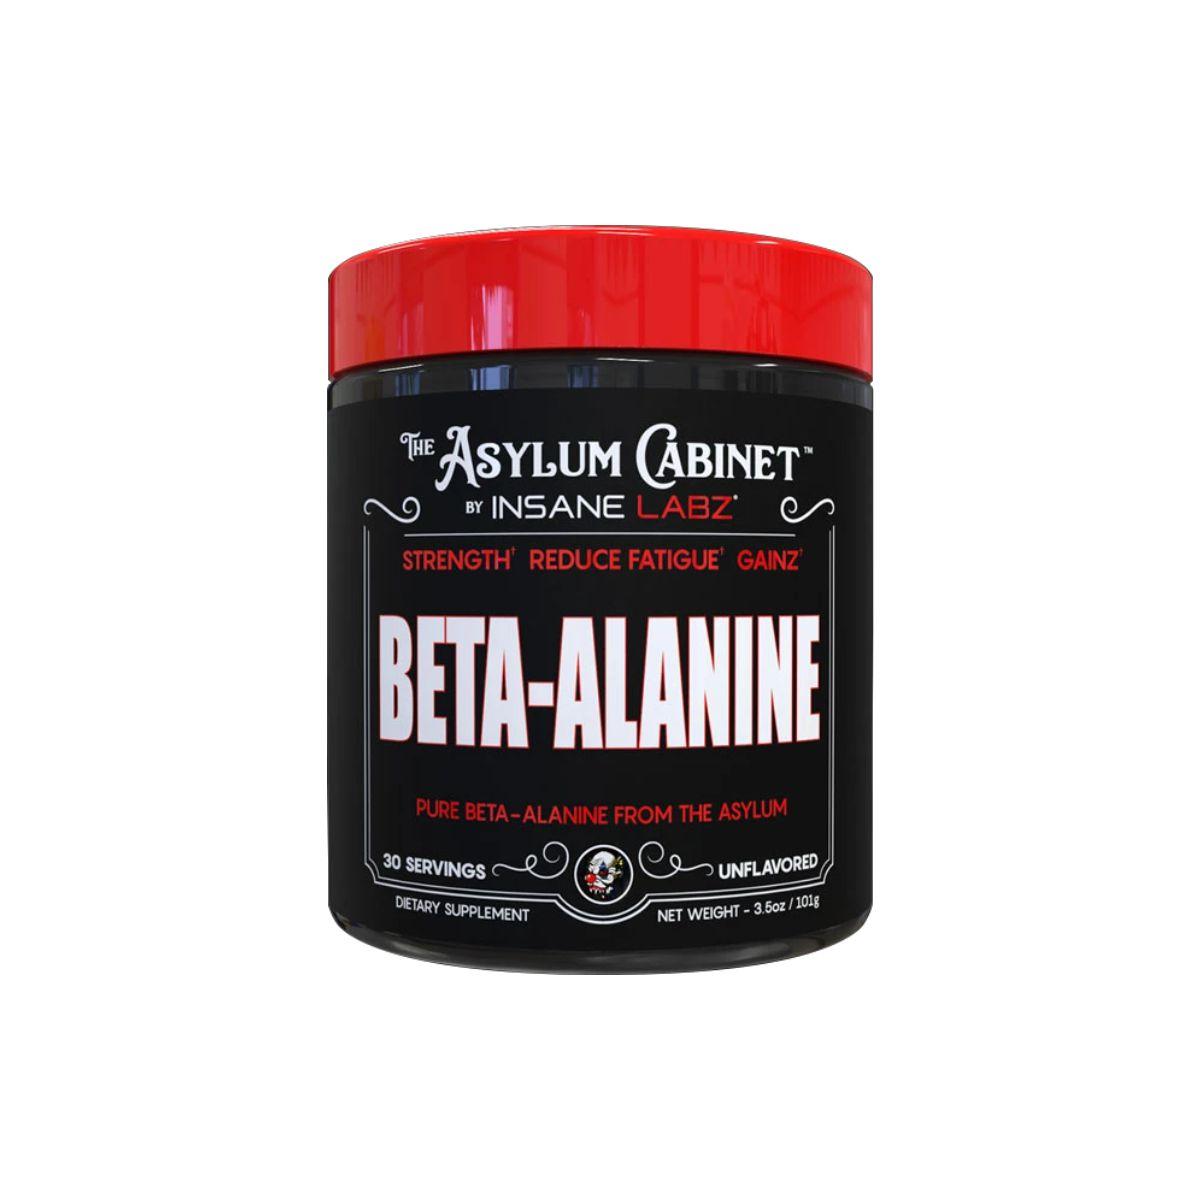 Beta Alanine 30 Doses 101g - Insane Labz